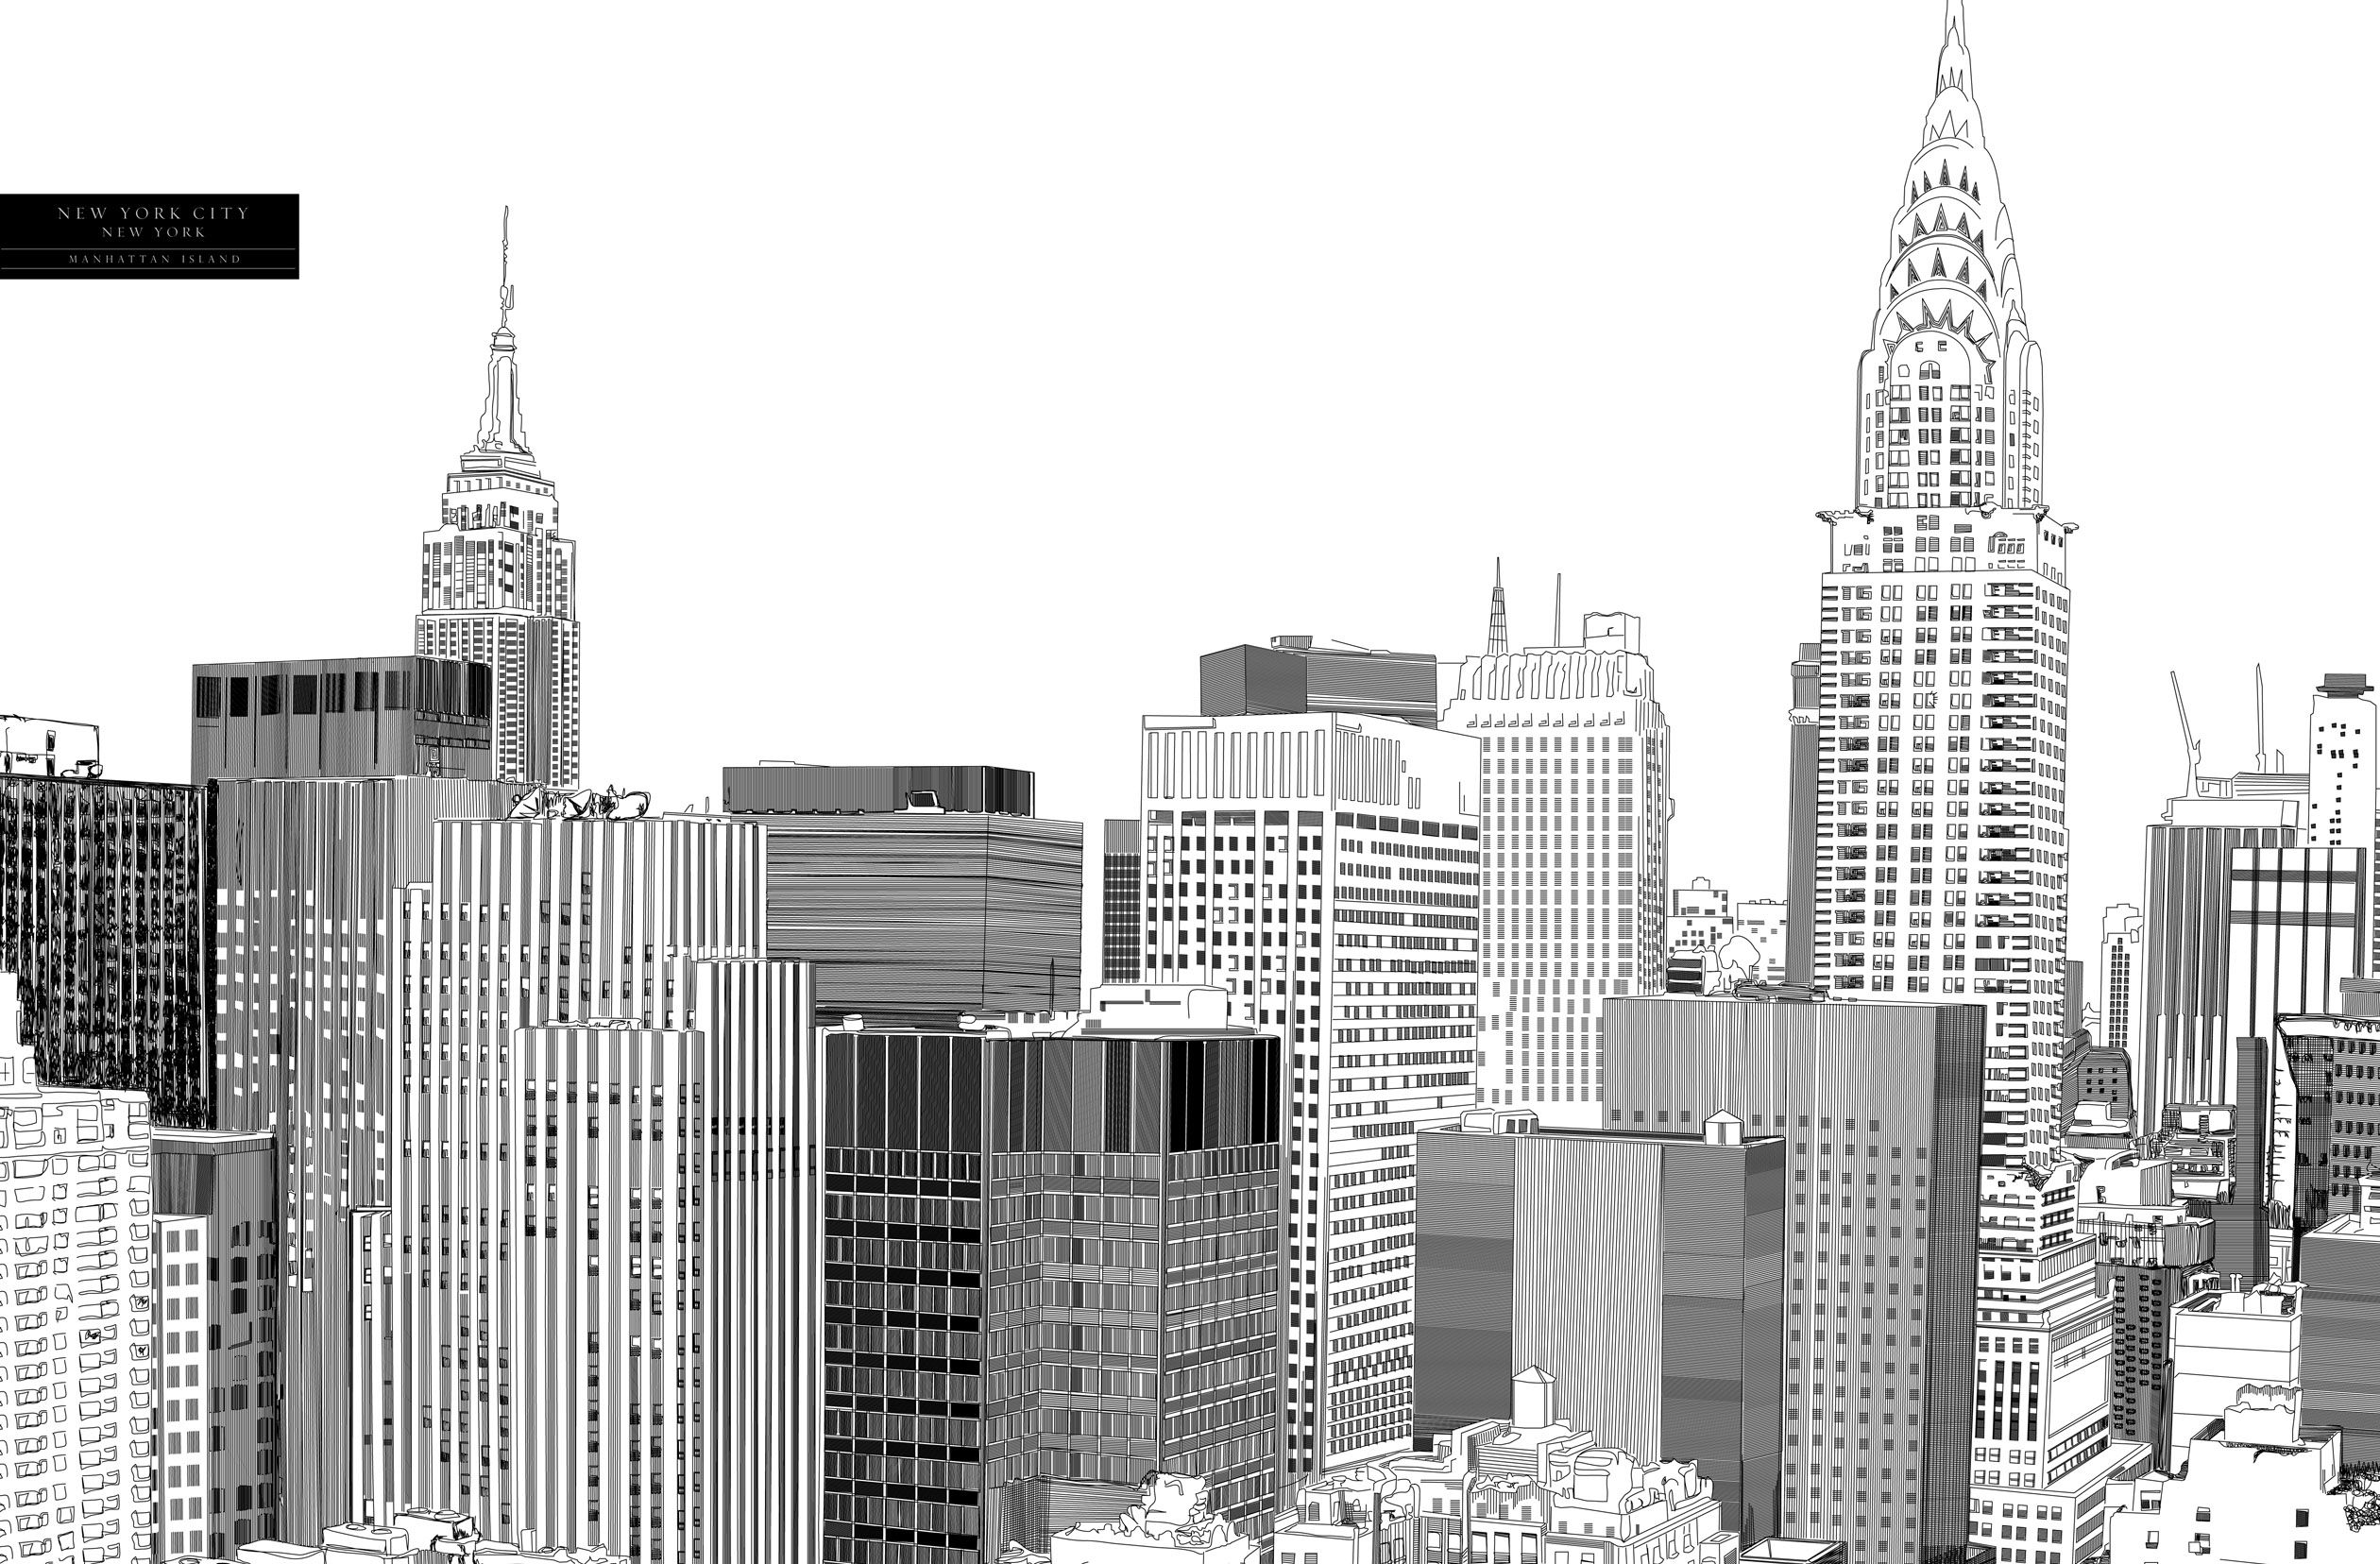 New York City Skyline Sketch Handdrawn Stock Vector 585852449 ...